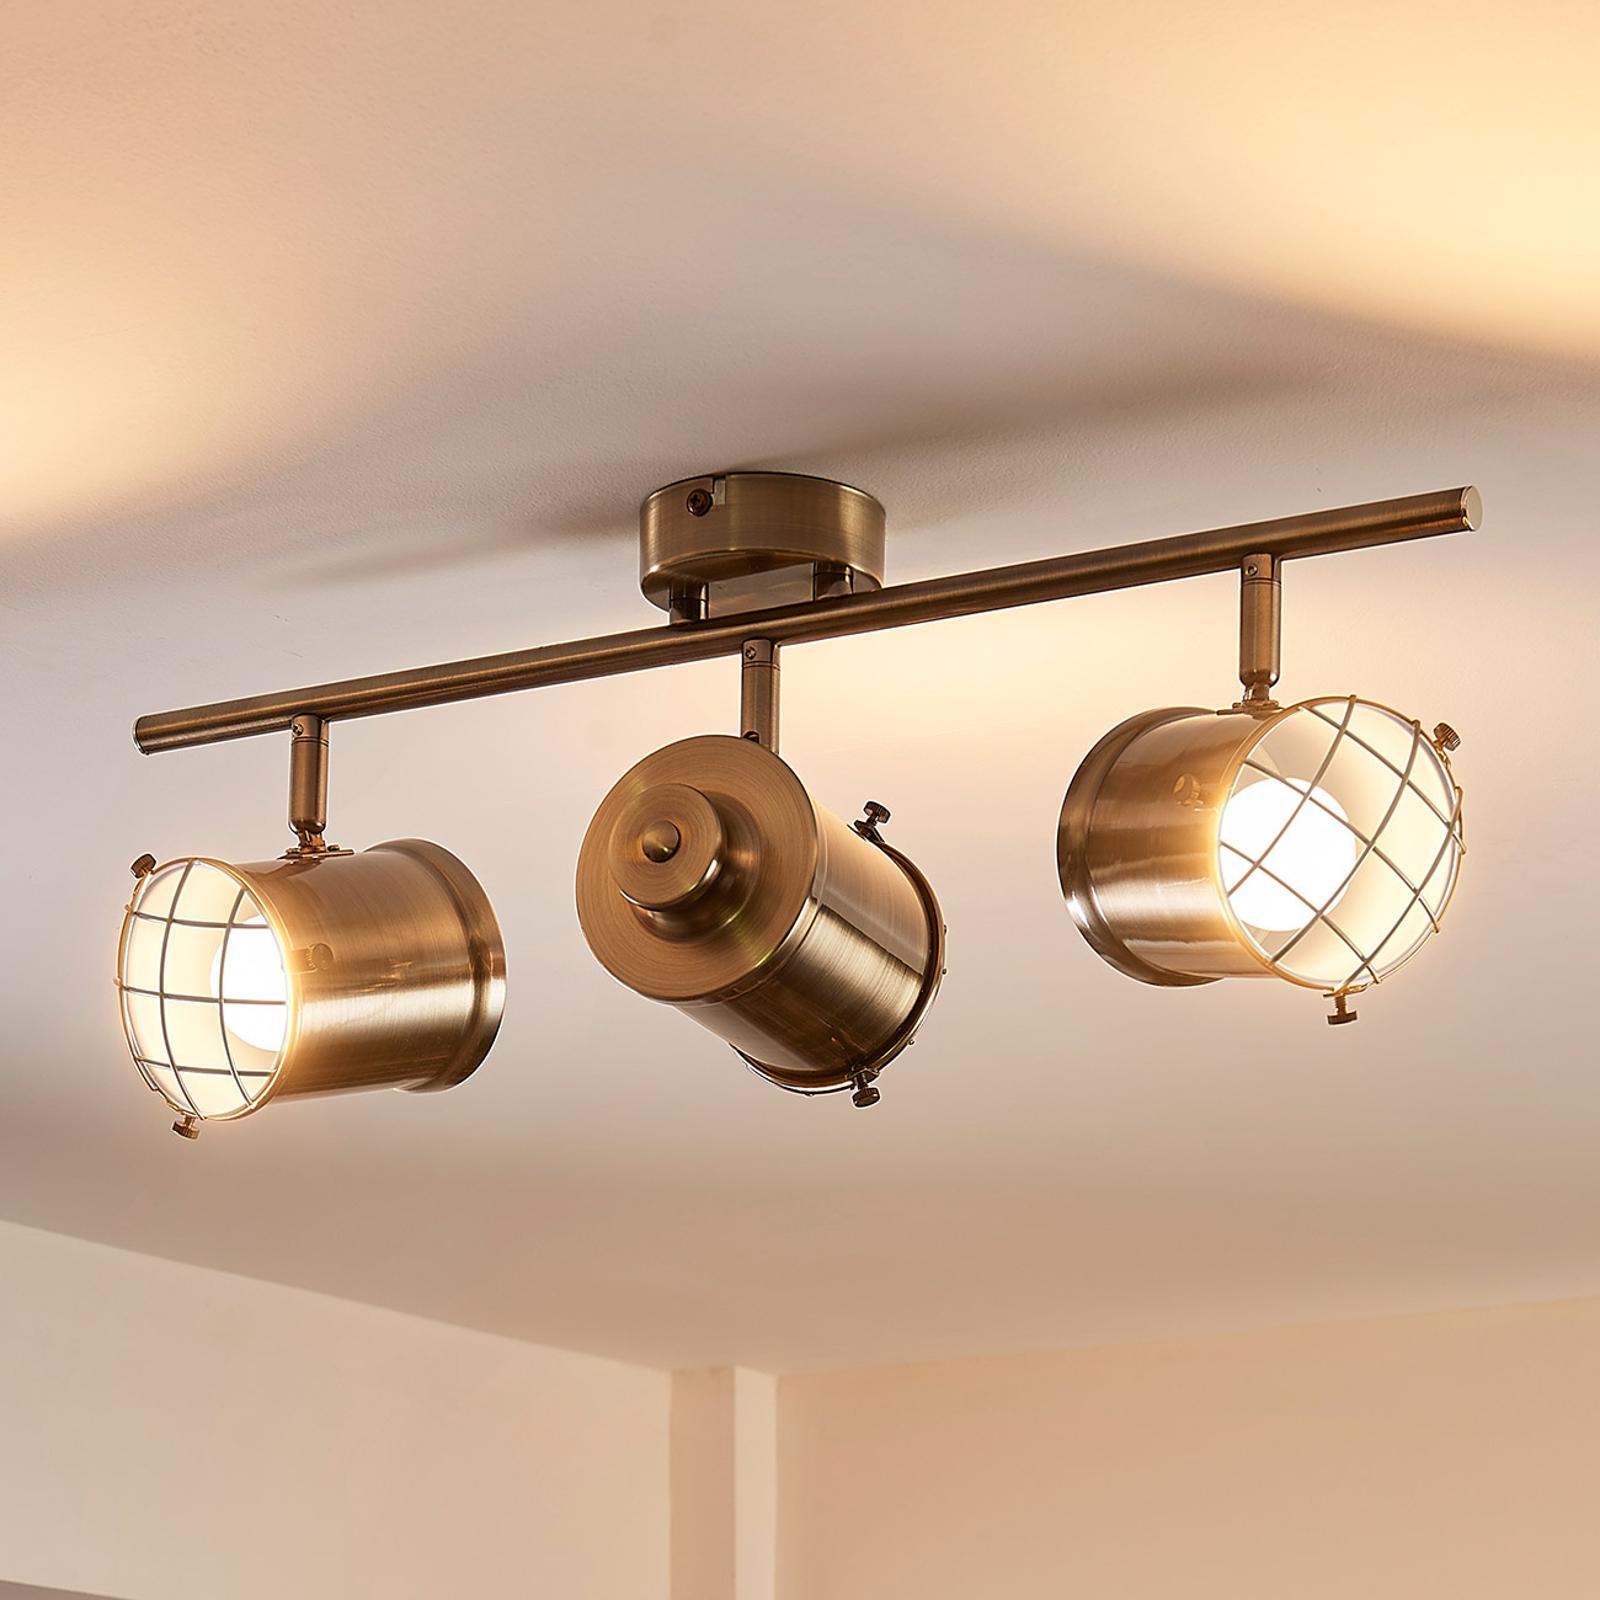 Dreiflammige Easydim-Deckenlampe Ebbi mit LED